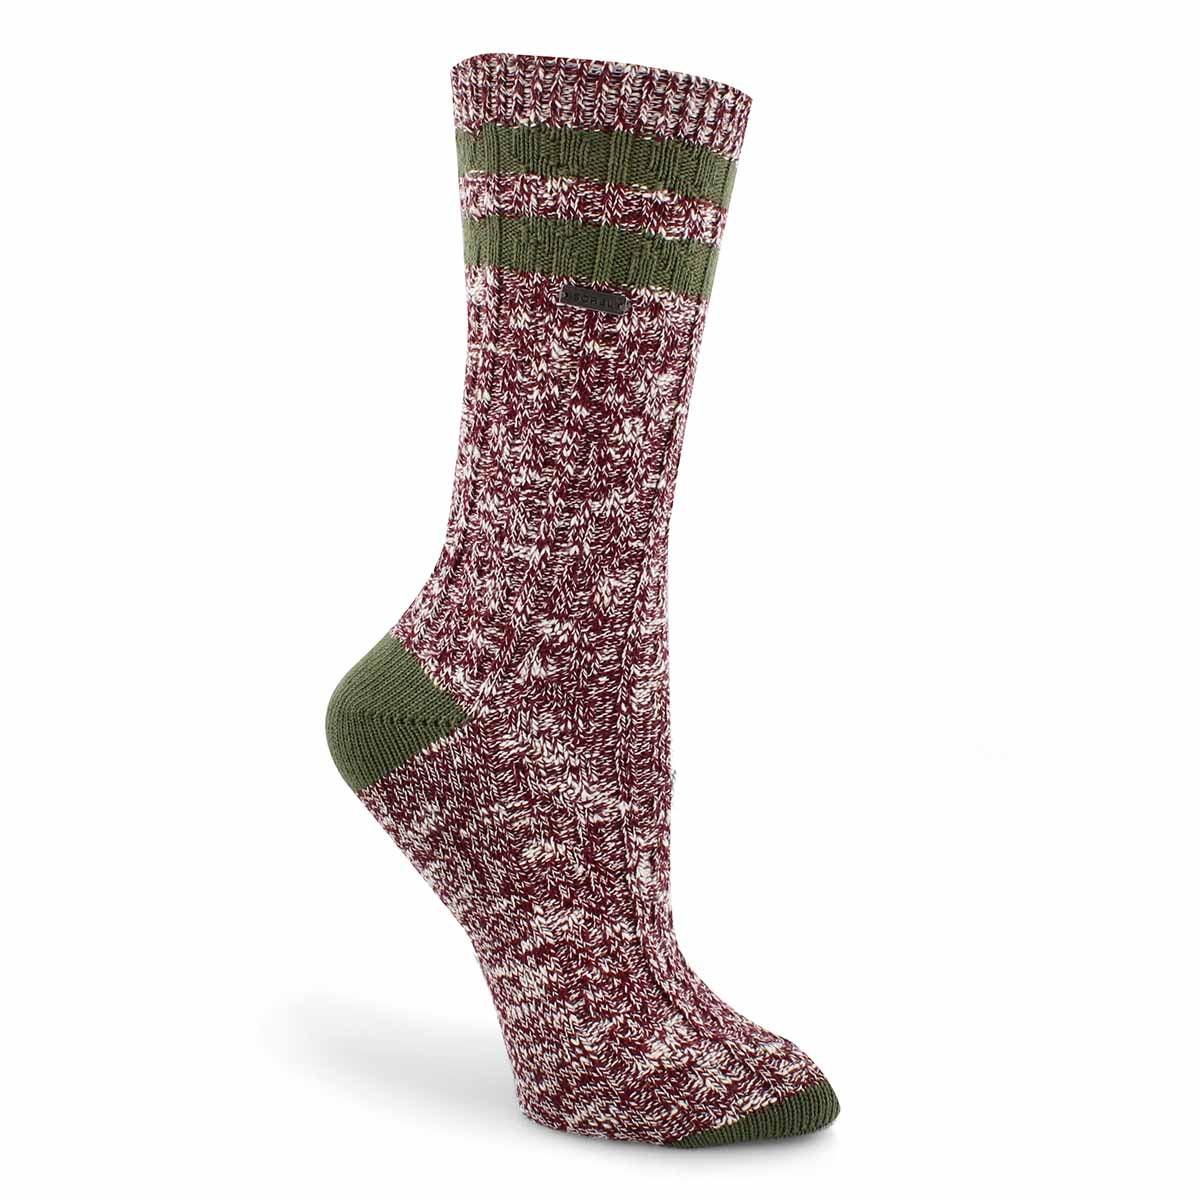 Lds VarsityStripe wine/green tall sock